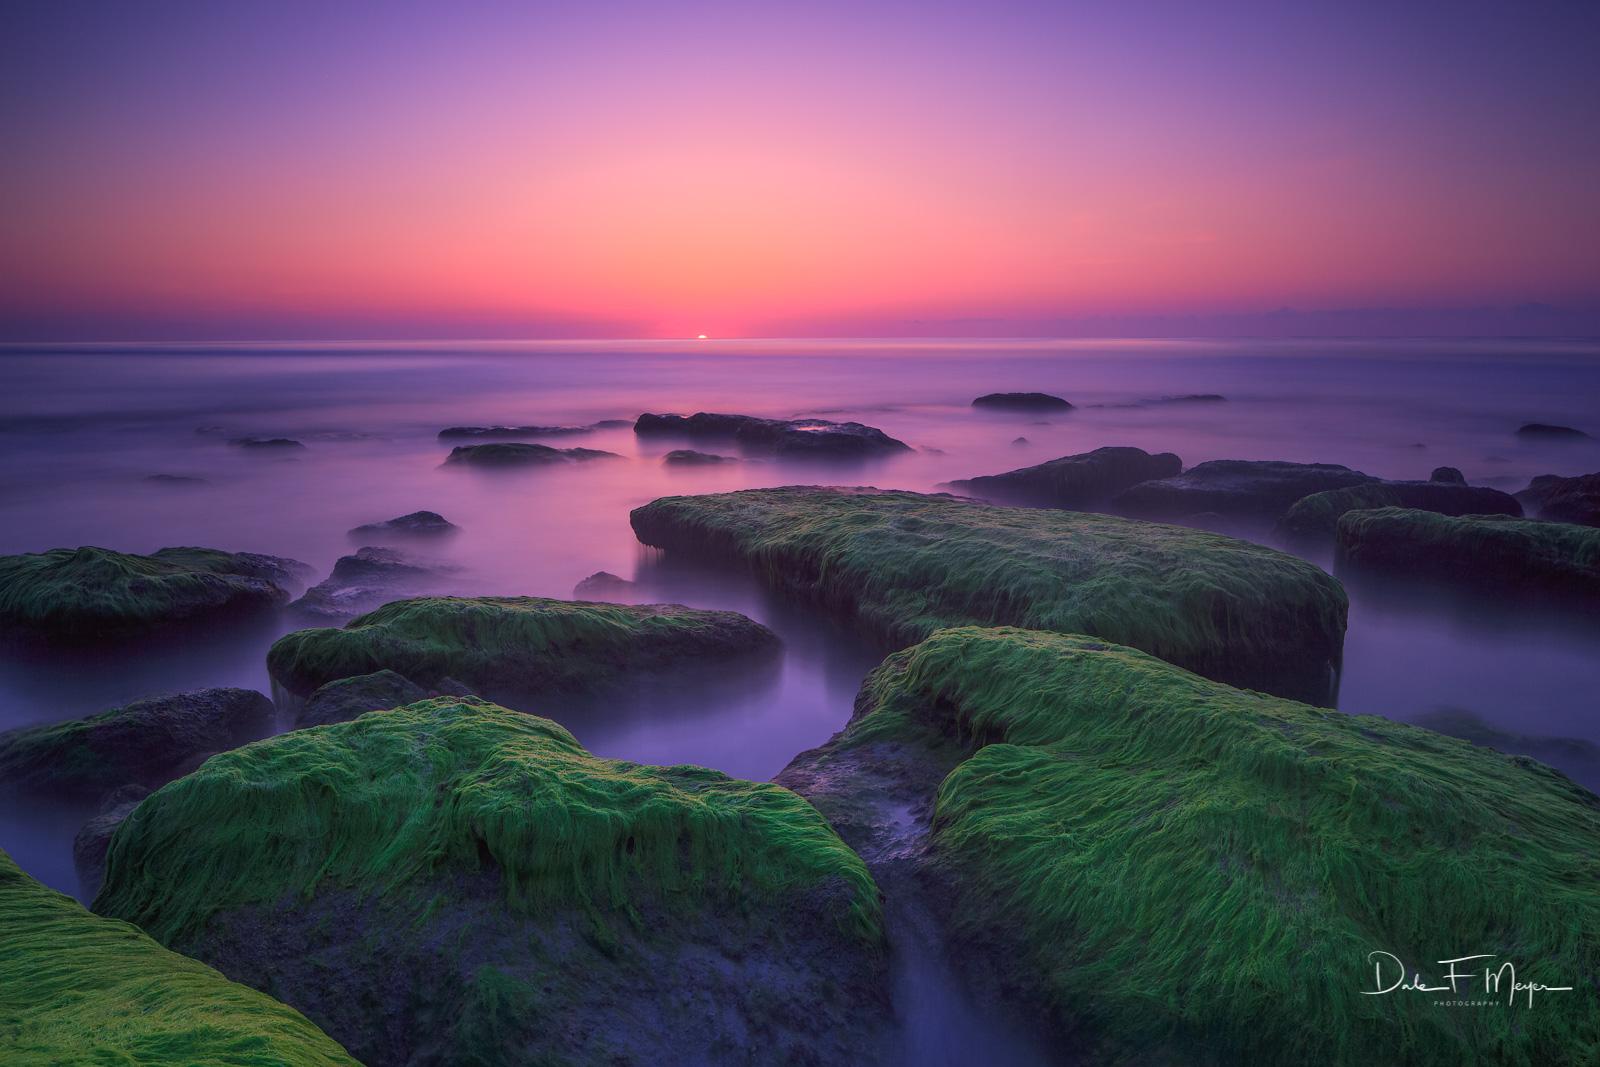 Coquina Rocks,Morning Light, Carolina Beach, North Carolina, photo